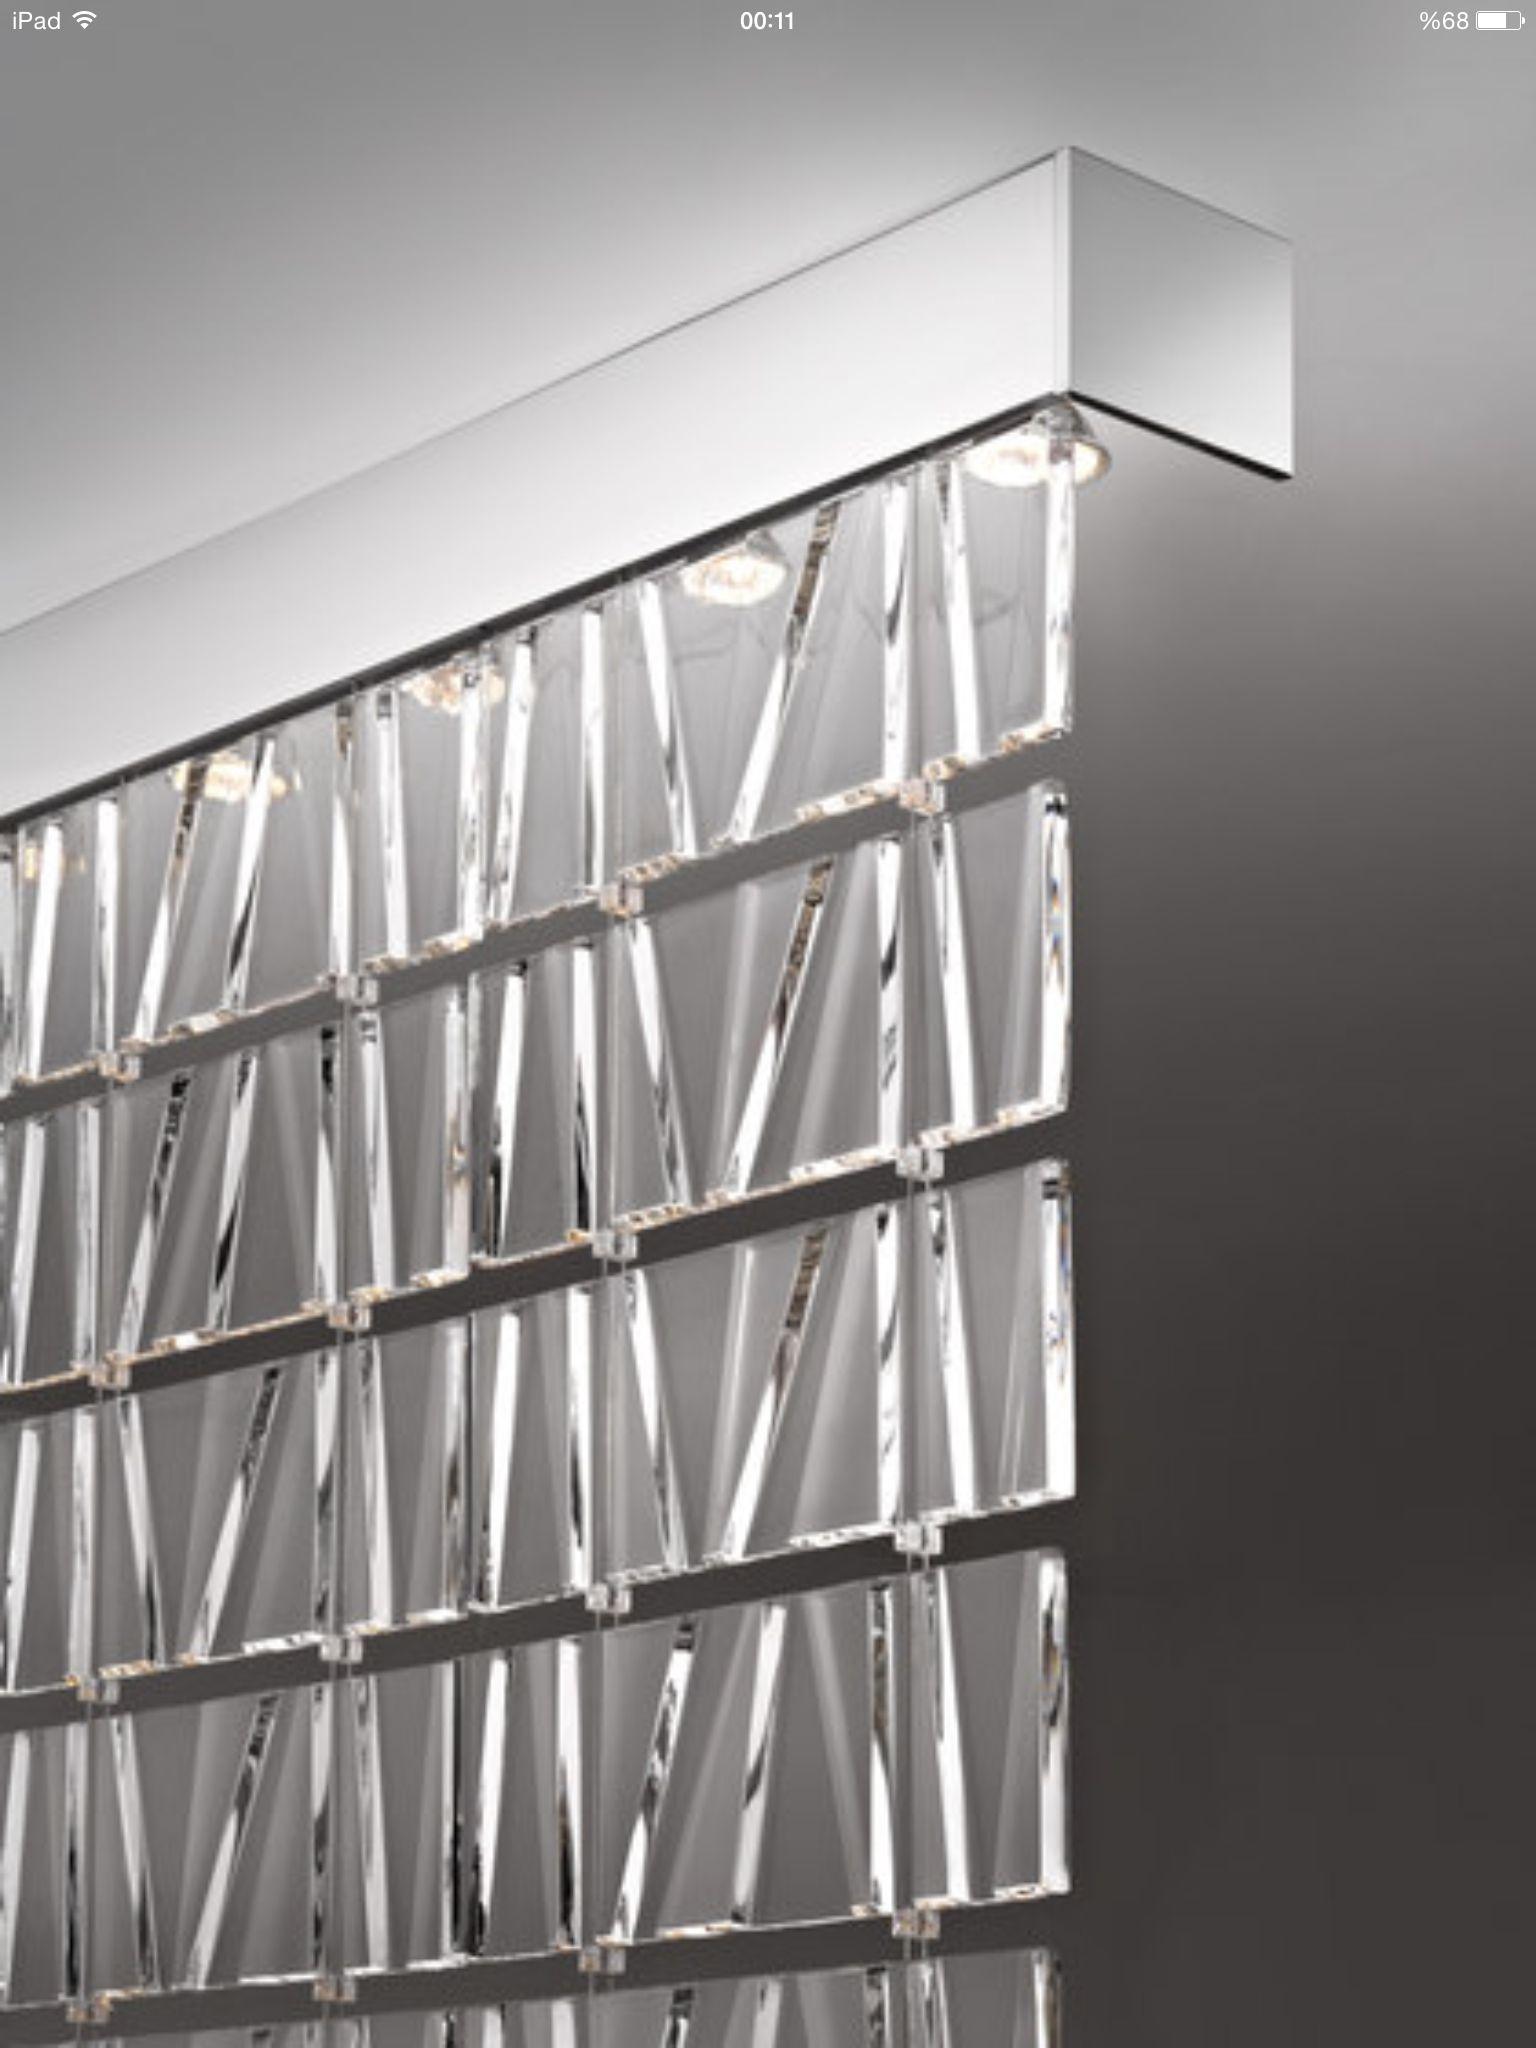 Fabbian illuminazione spa | Lighting Elements | Wall lights, Tiles ...